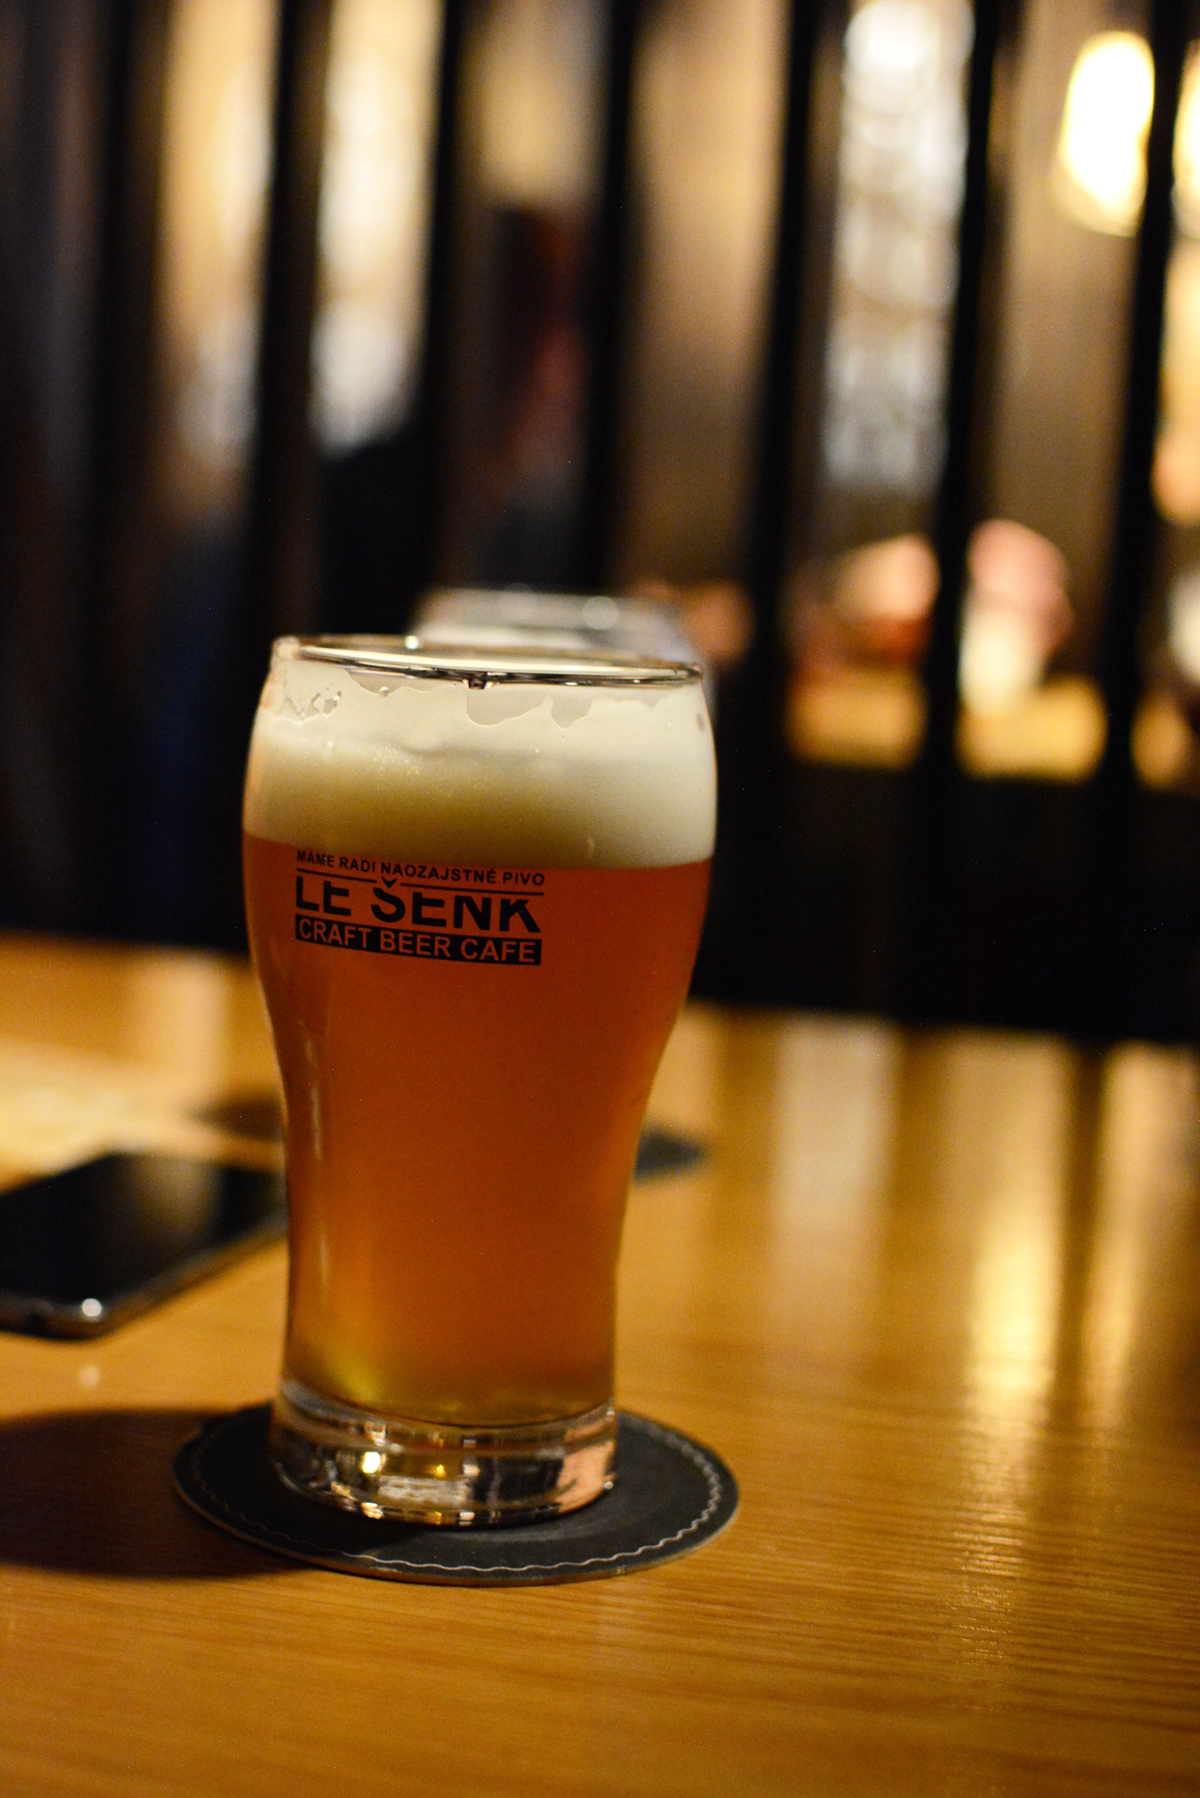 Le Senk in Bratislava |Pixi mit Milch